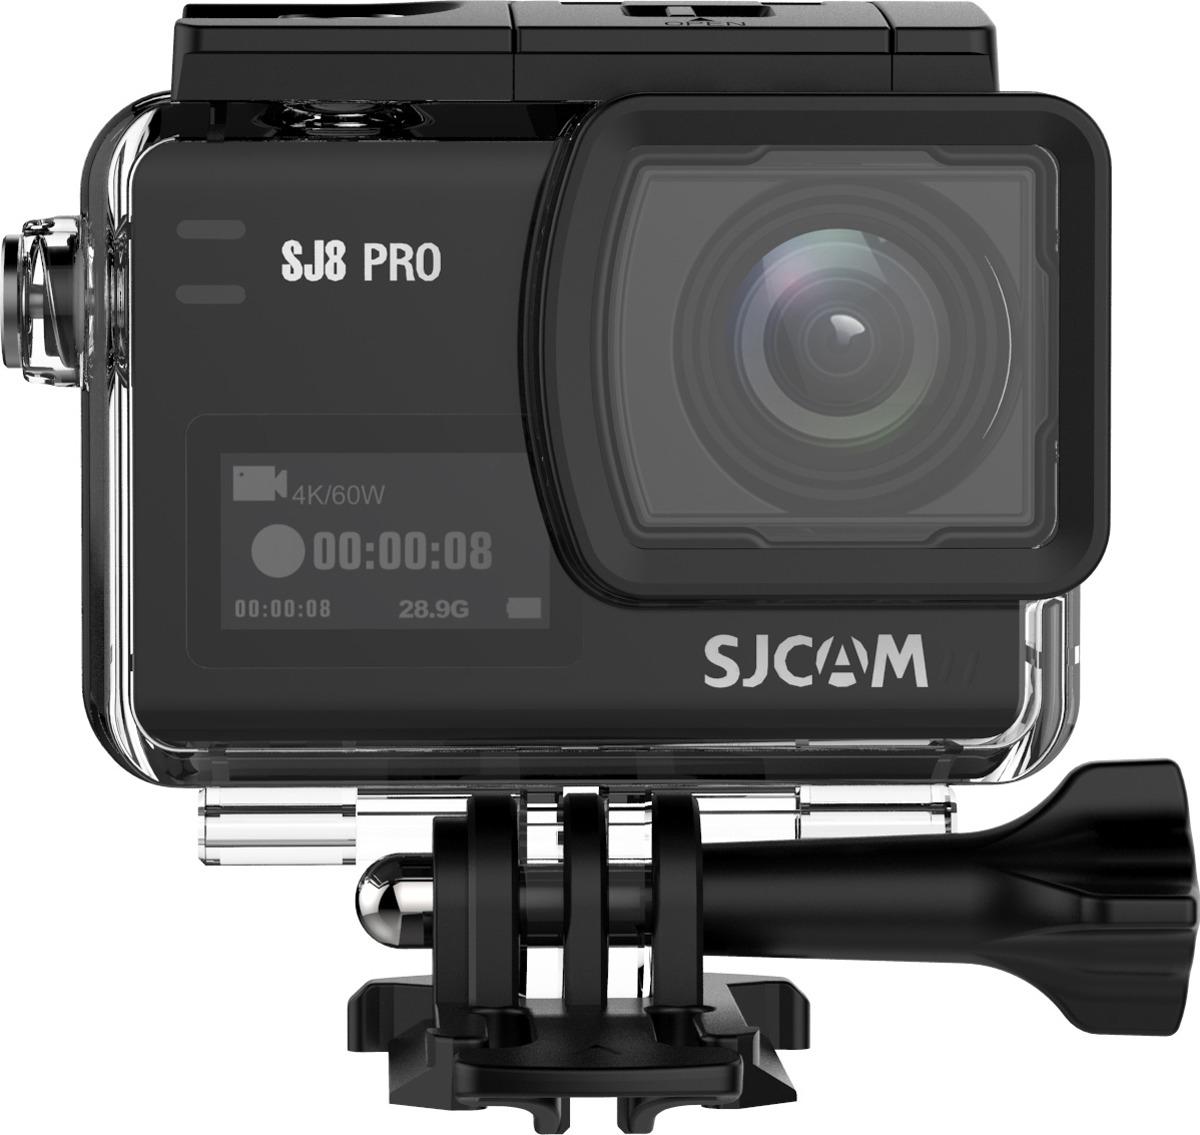 Экшн-камера SJCAM SJ8 Pro, SJ8 Pro (black), черный экшн камера sjcam sj8 pro черная